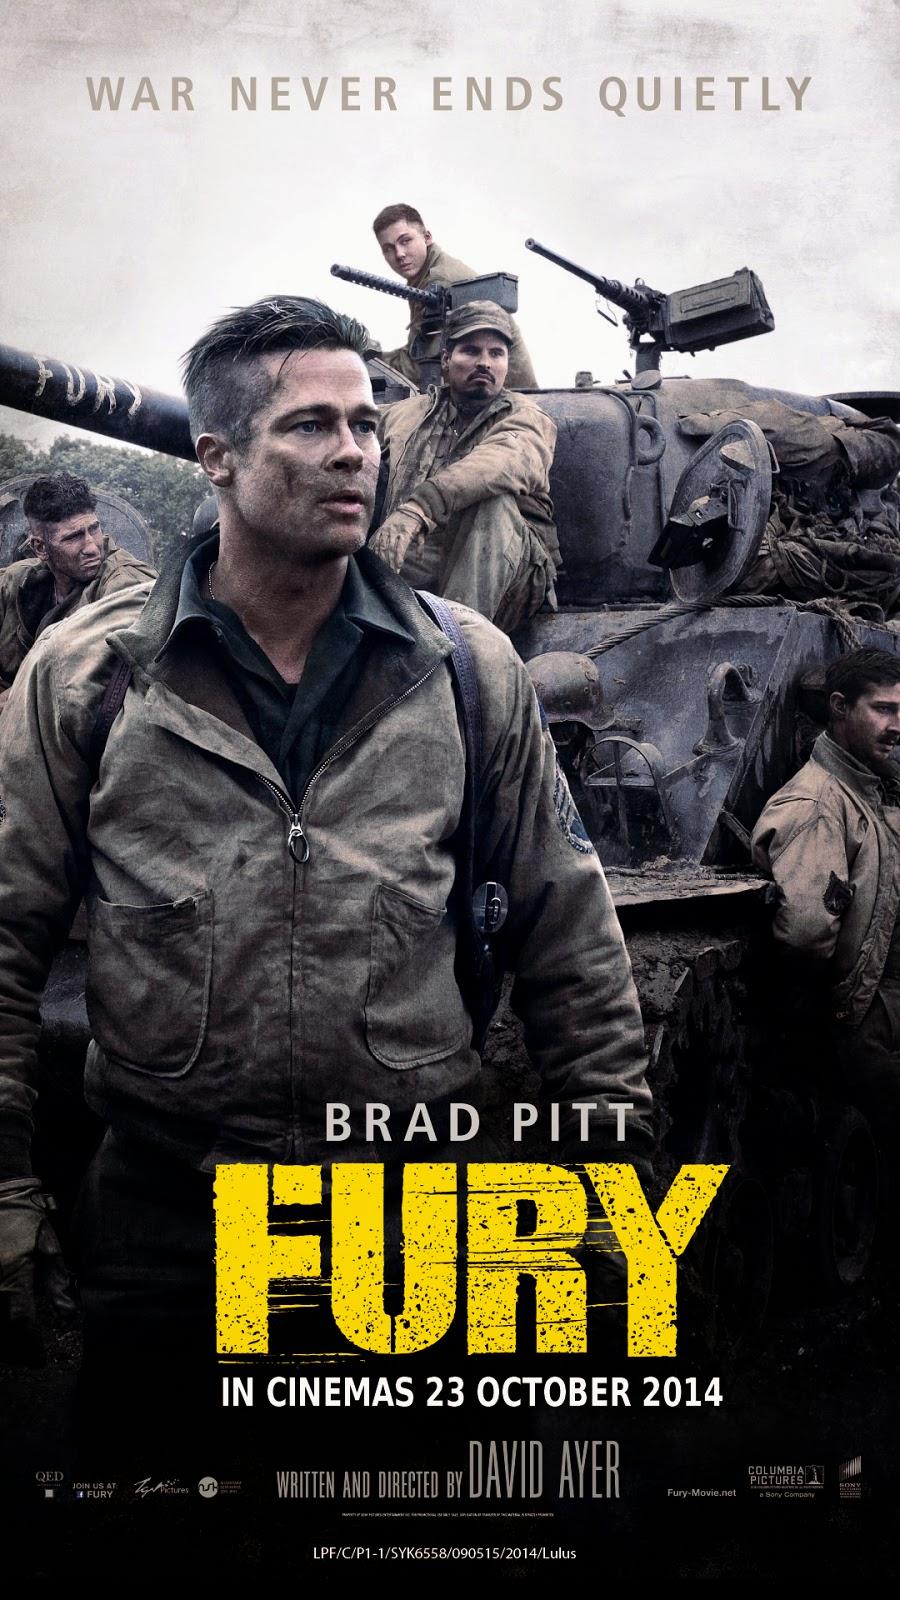 fury 2014 brad pitt poster wwwimgkidcom the image